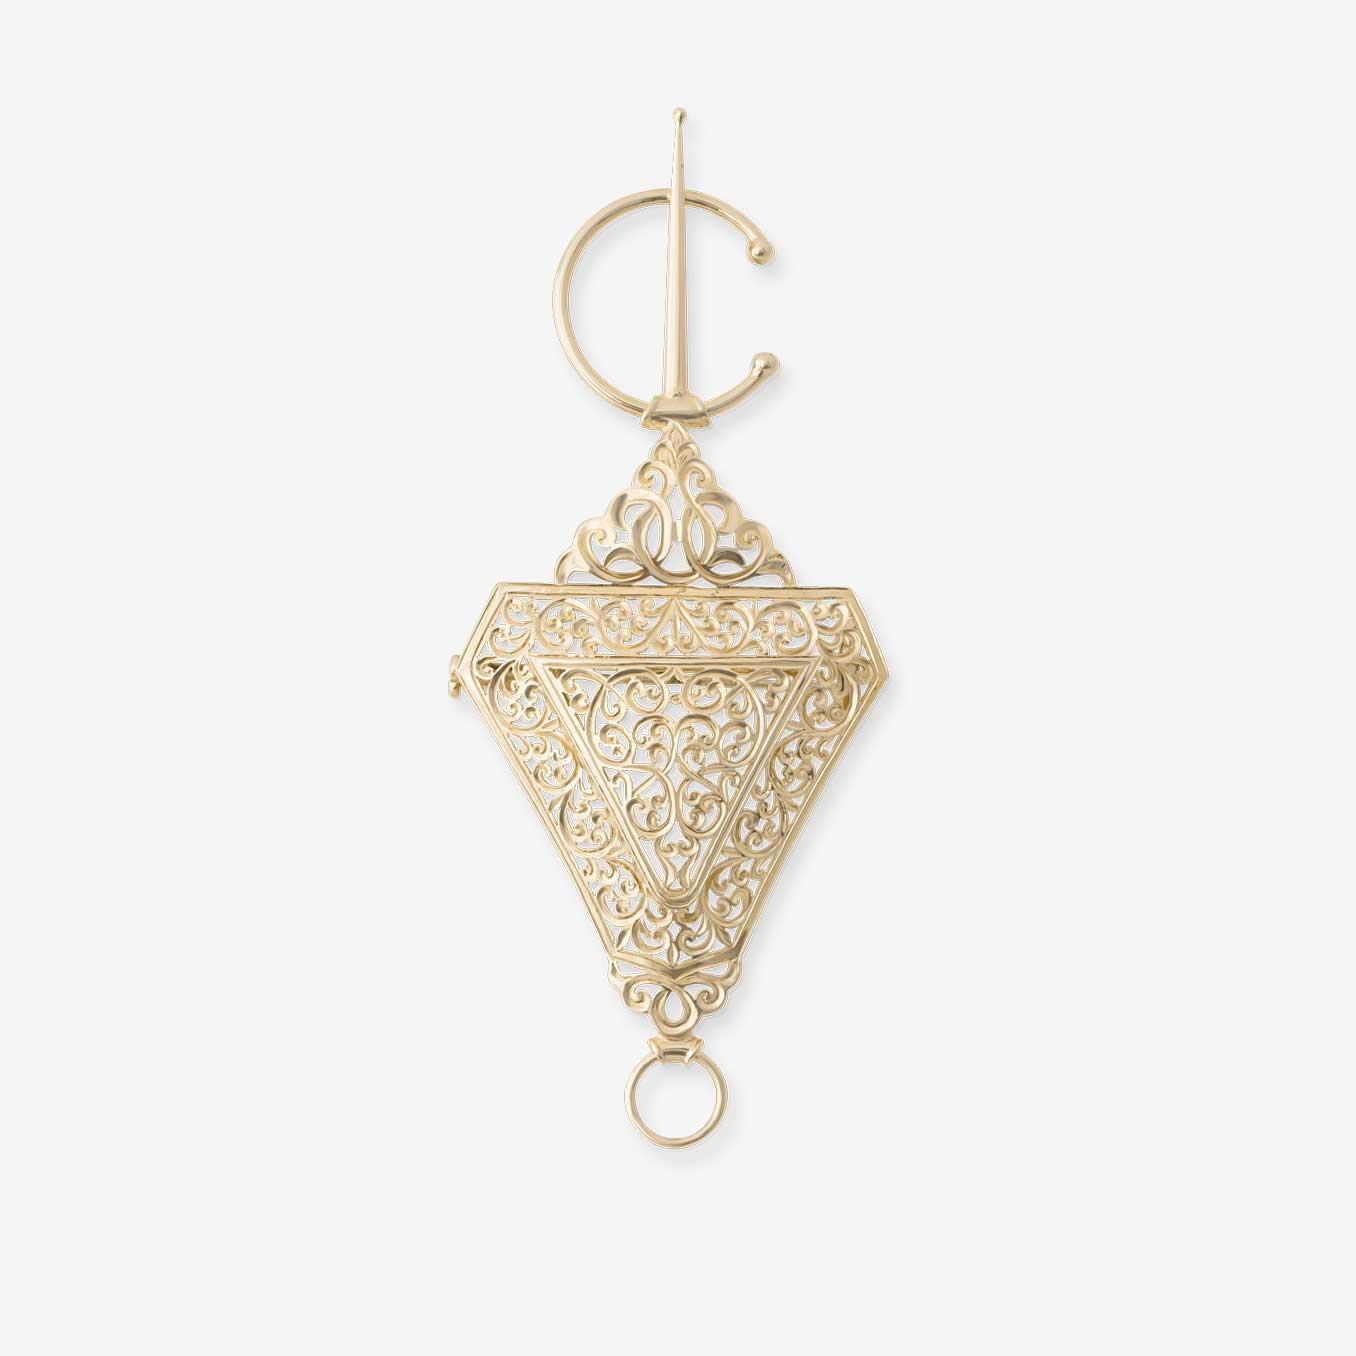 Broche-beldi-traditionnel-Mounier-et-bouvard-or-jaune-18-carats-bijouterie-traditionnelle-maroc-bijoux-beldi